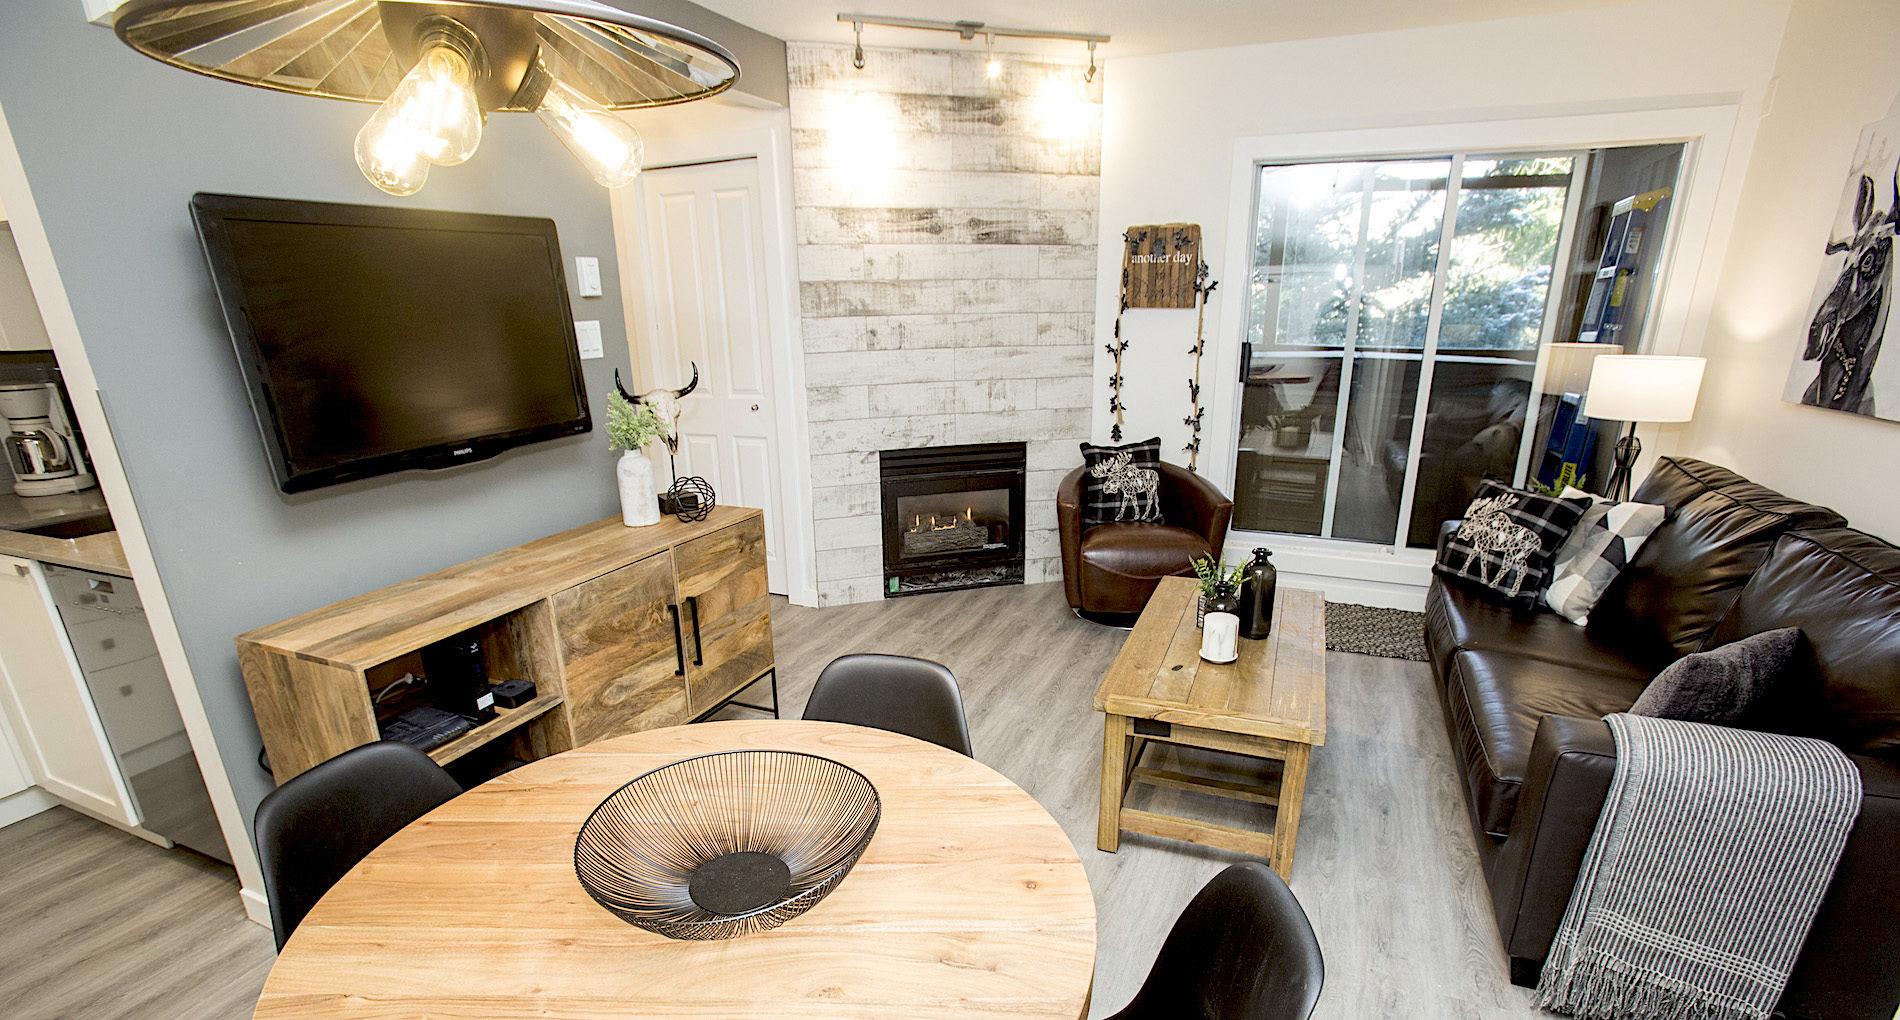 Home Renovation Tricities Glaciersreachcondo Slider